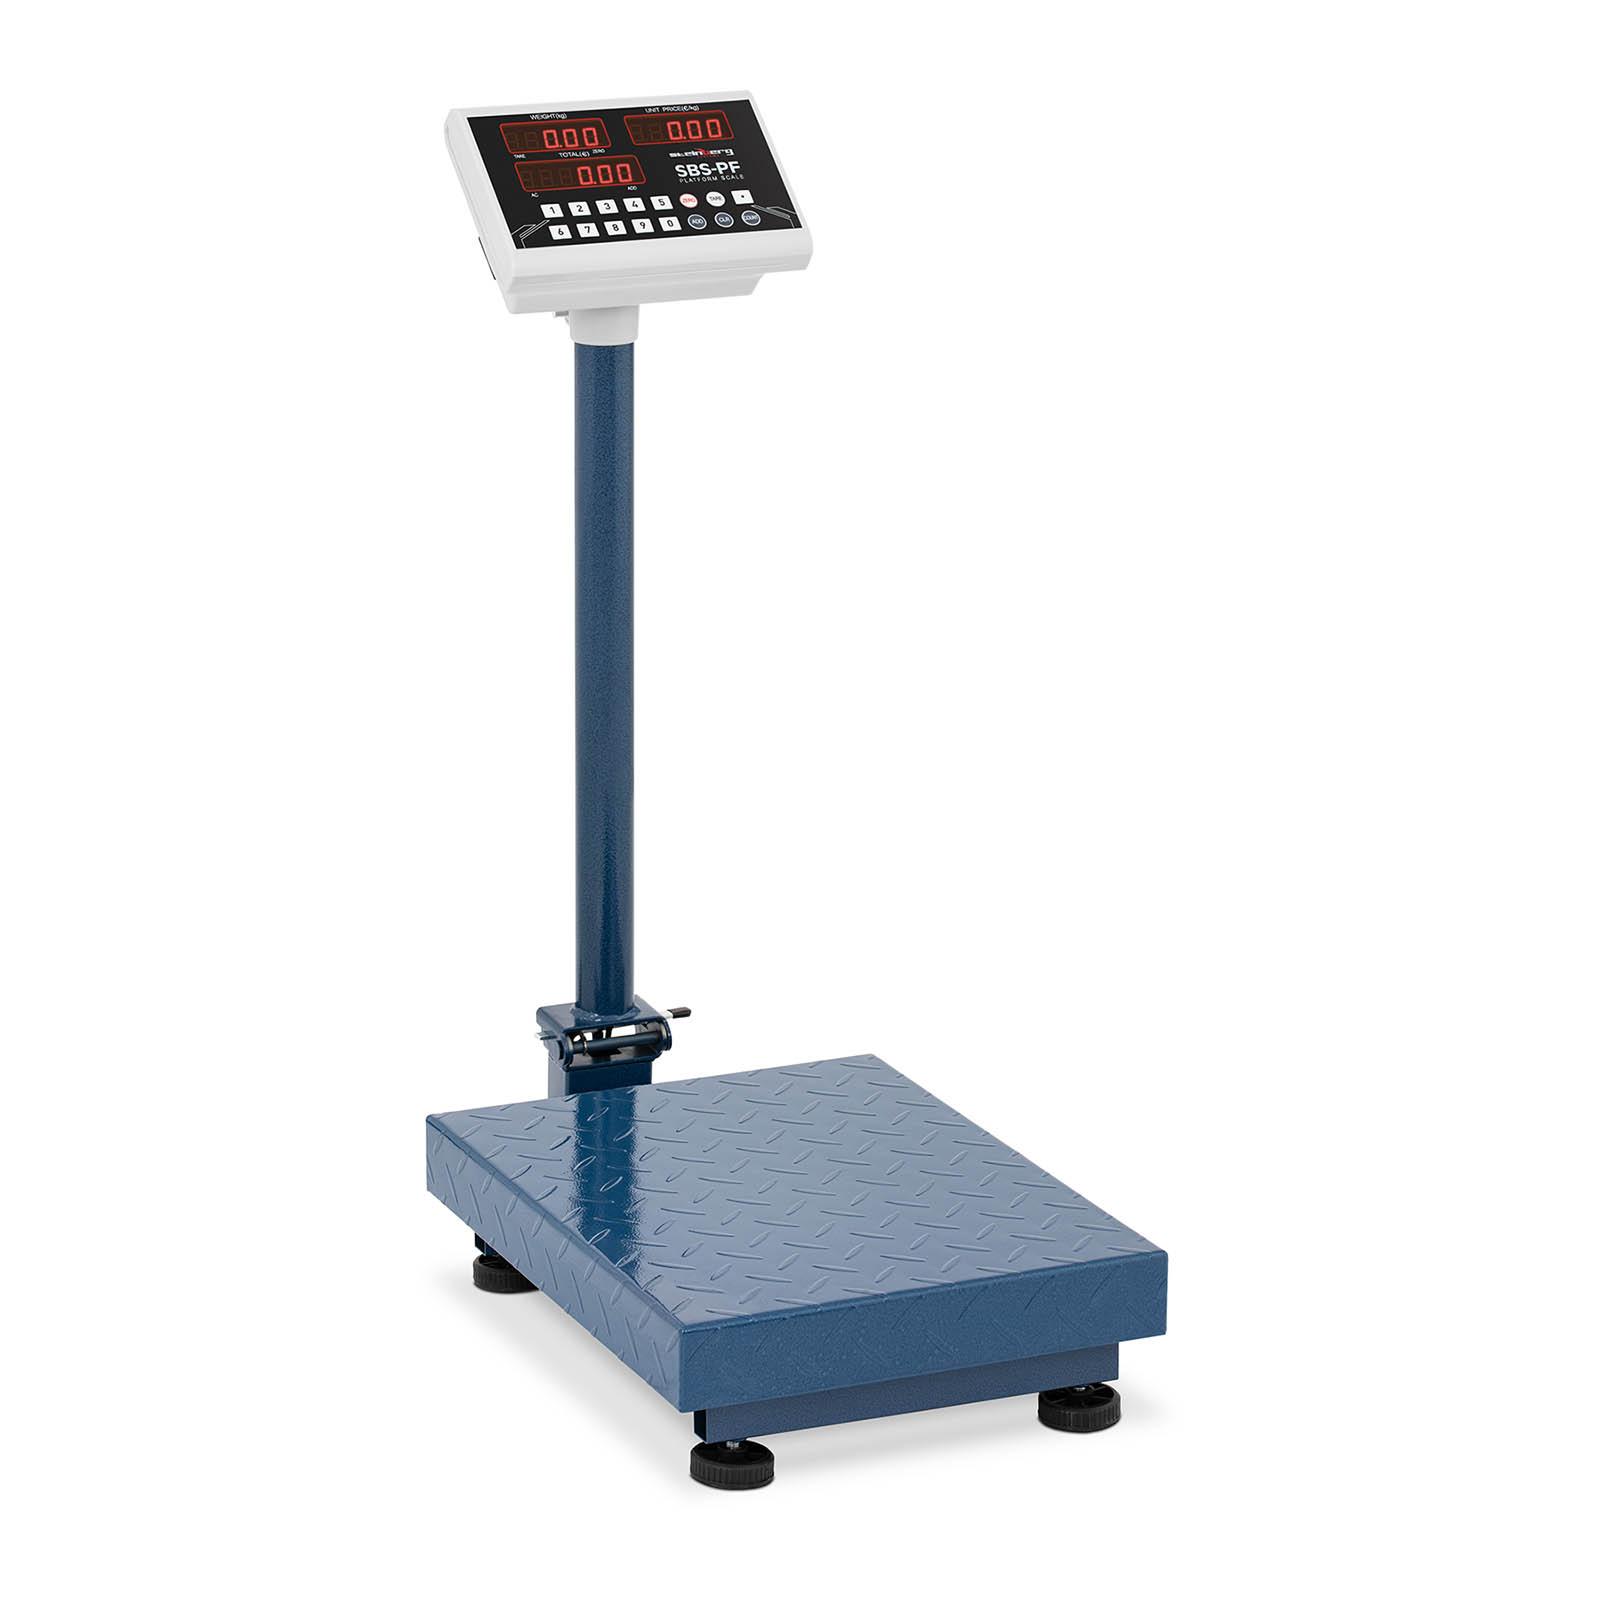 Platform Scale 100kg 10g Digital Heavy Duty Weighing